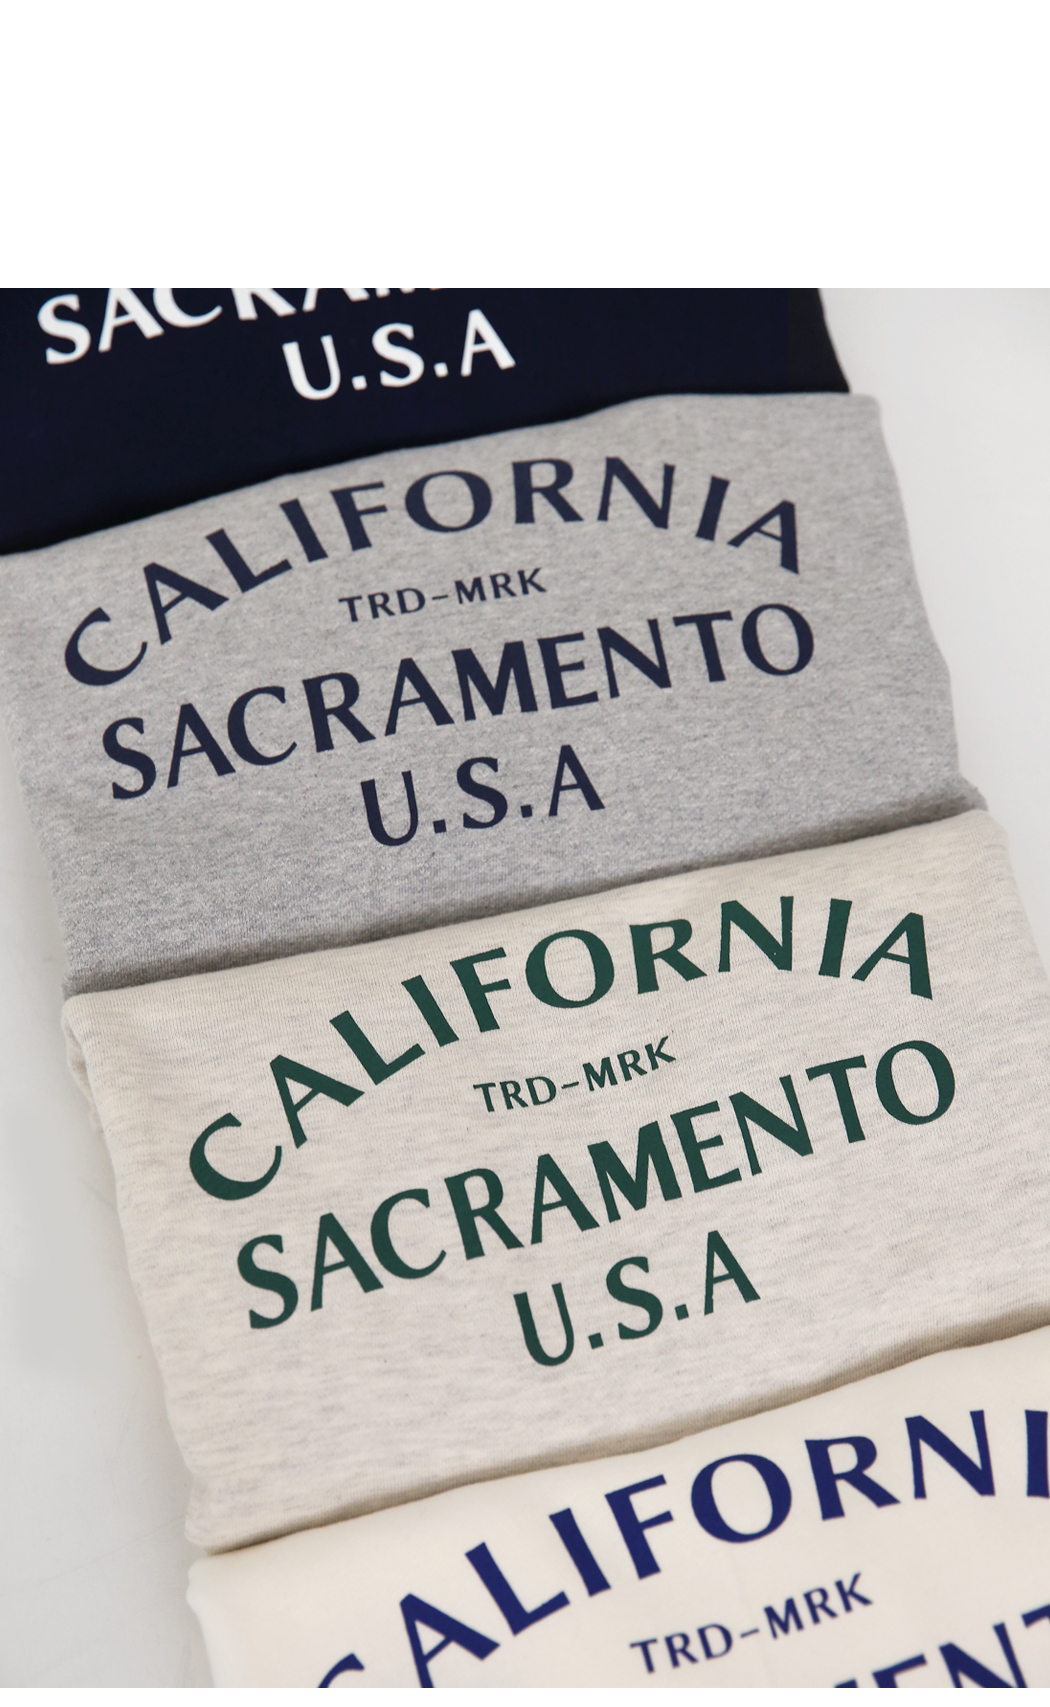 'California' embroidery sweat shirt